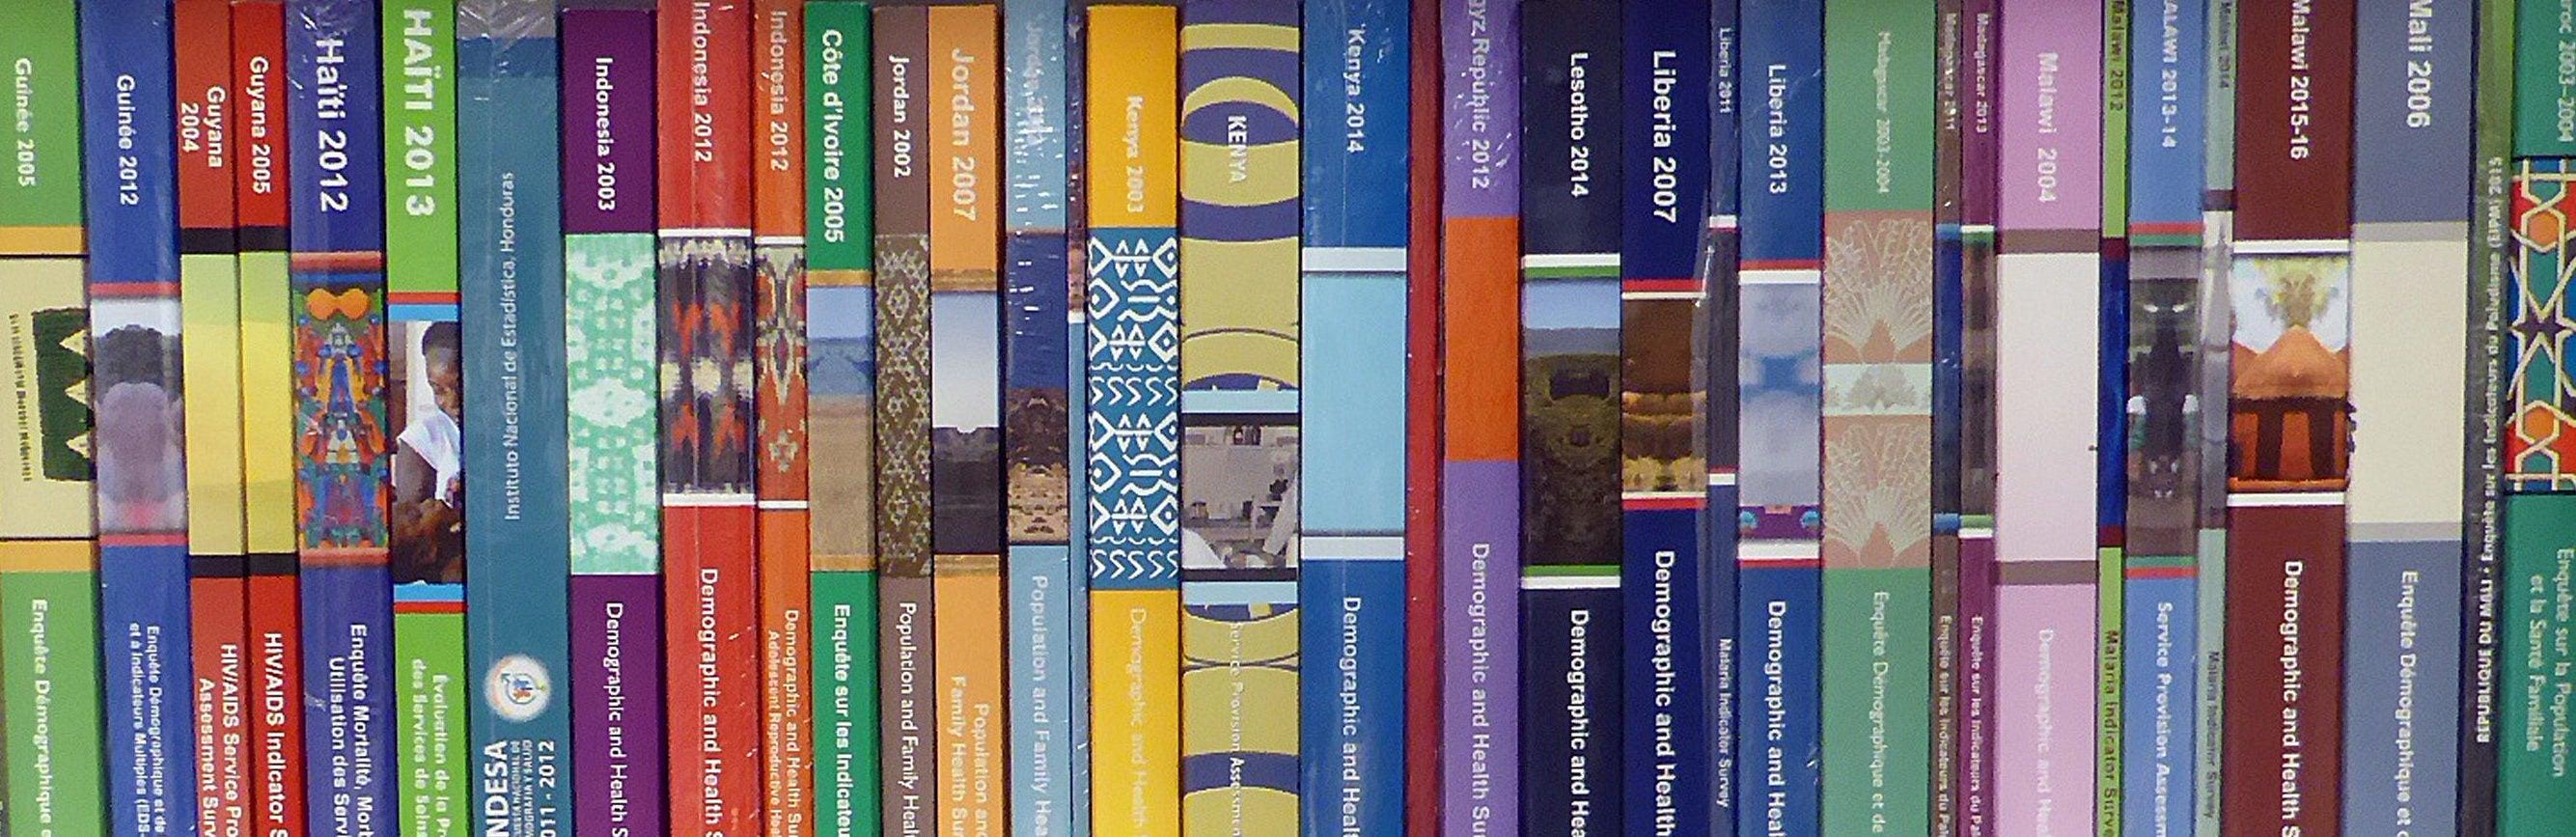 Bookshelf of Demographic and Health Surveys